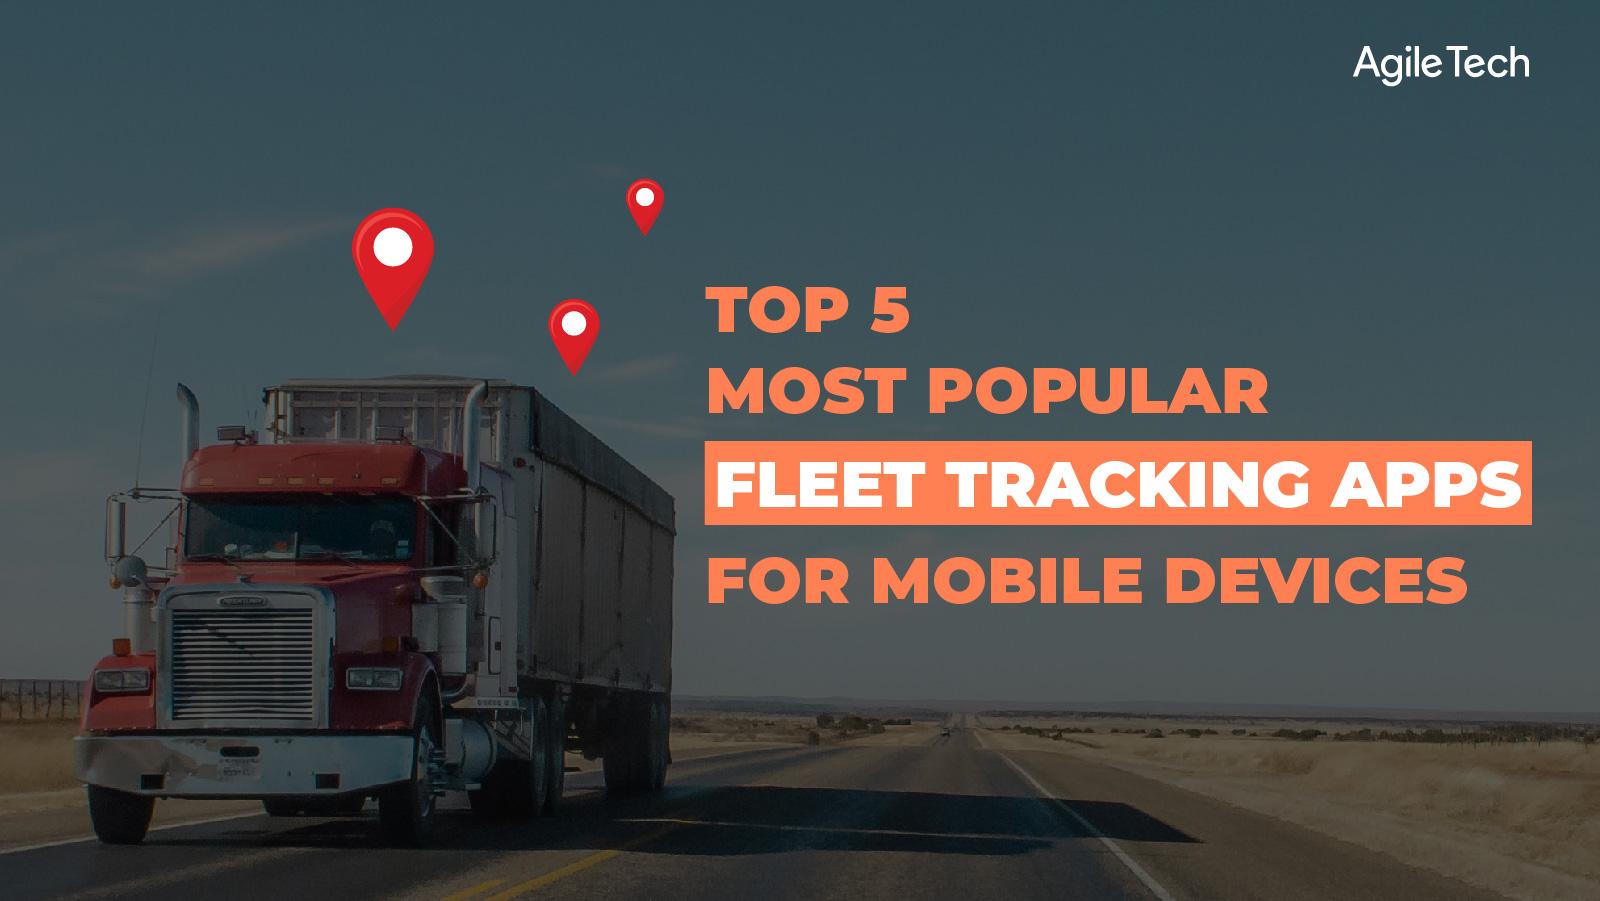 fleet tracking apps, top 5 most popular fleet management apps to track fleet vehicles location, agiletech